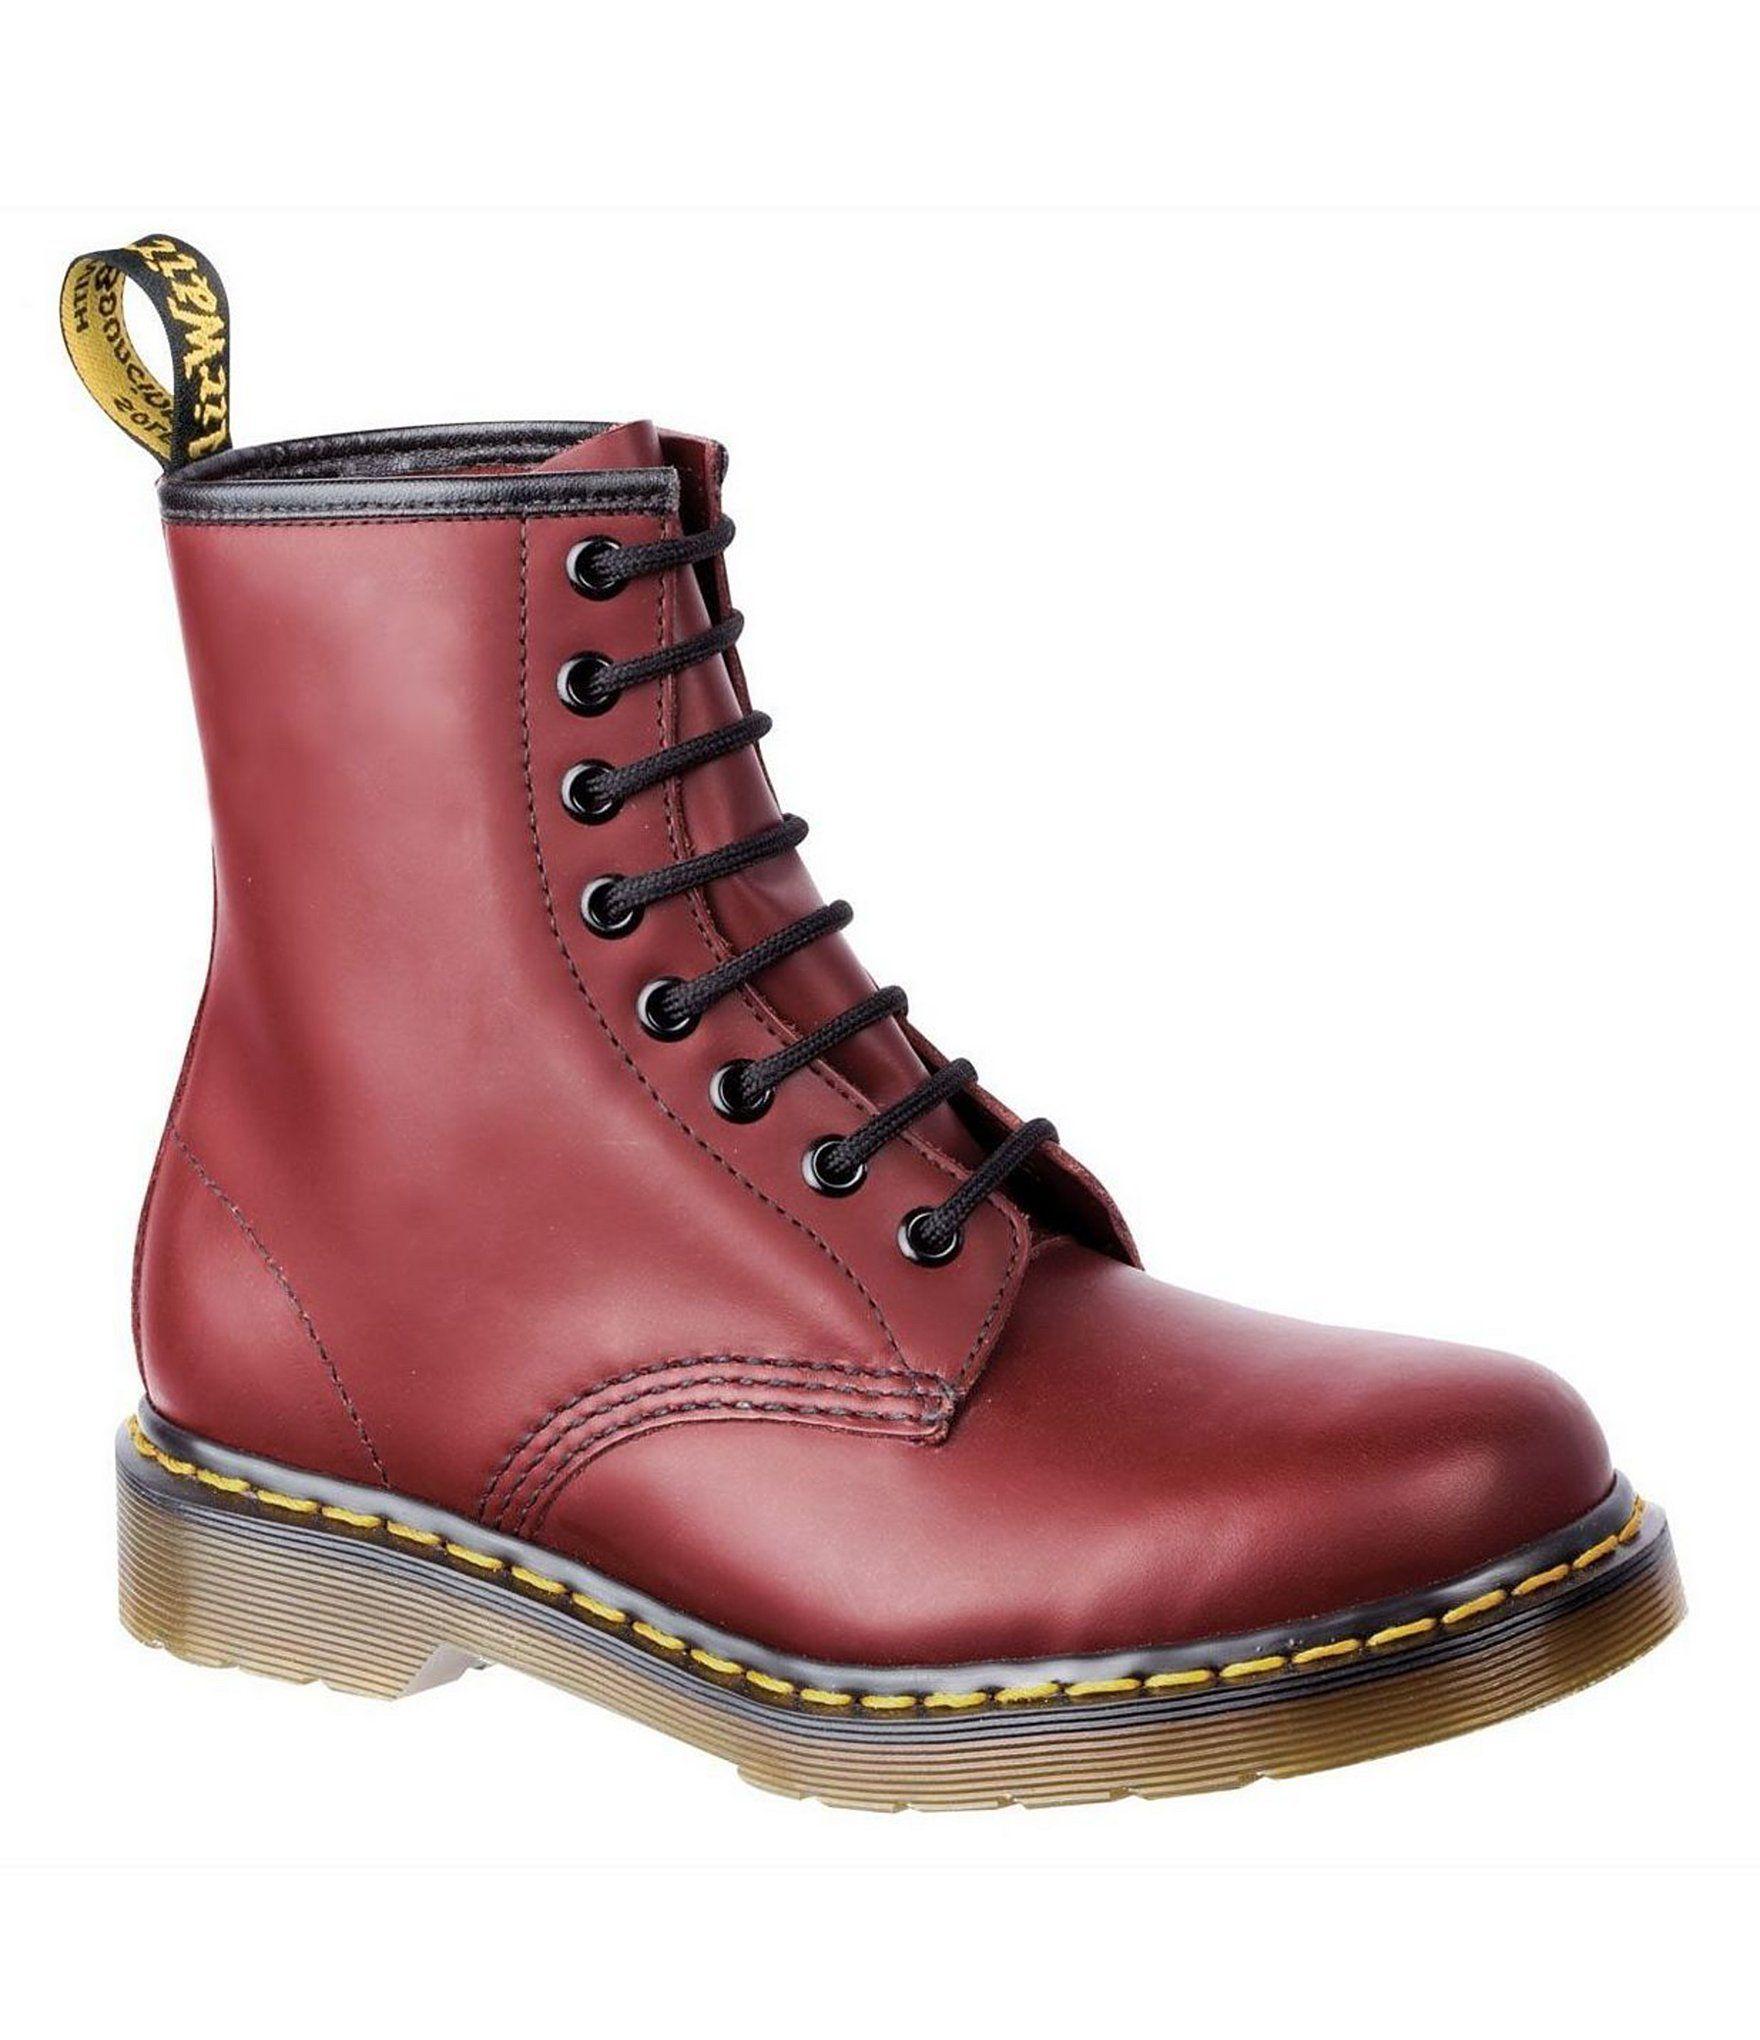 Dr. Martens 1460 Classic 8-Eye Combat Boots | Dillard's 1